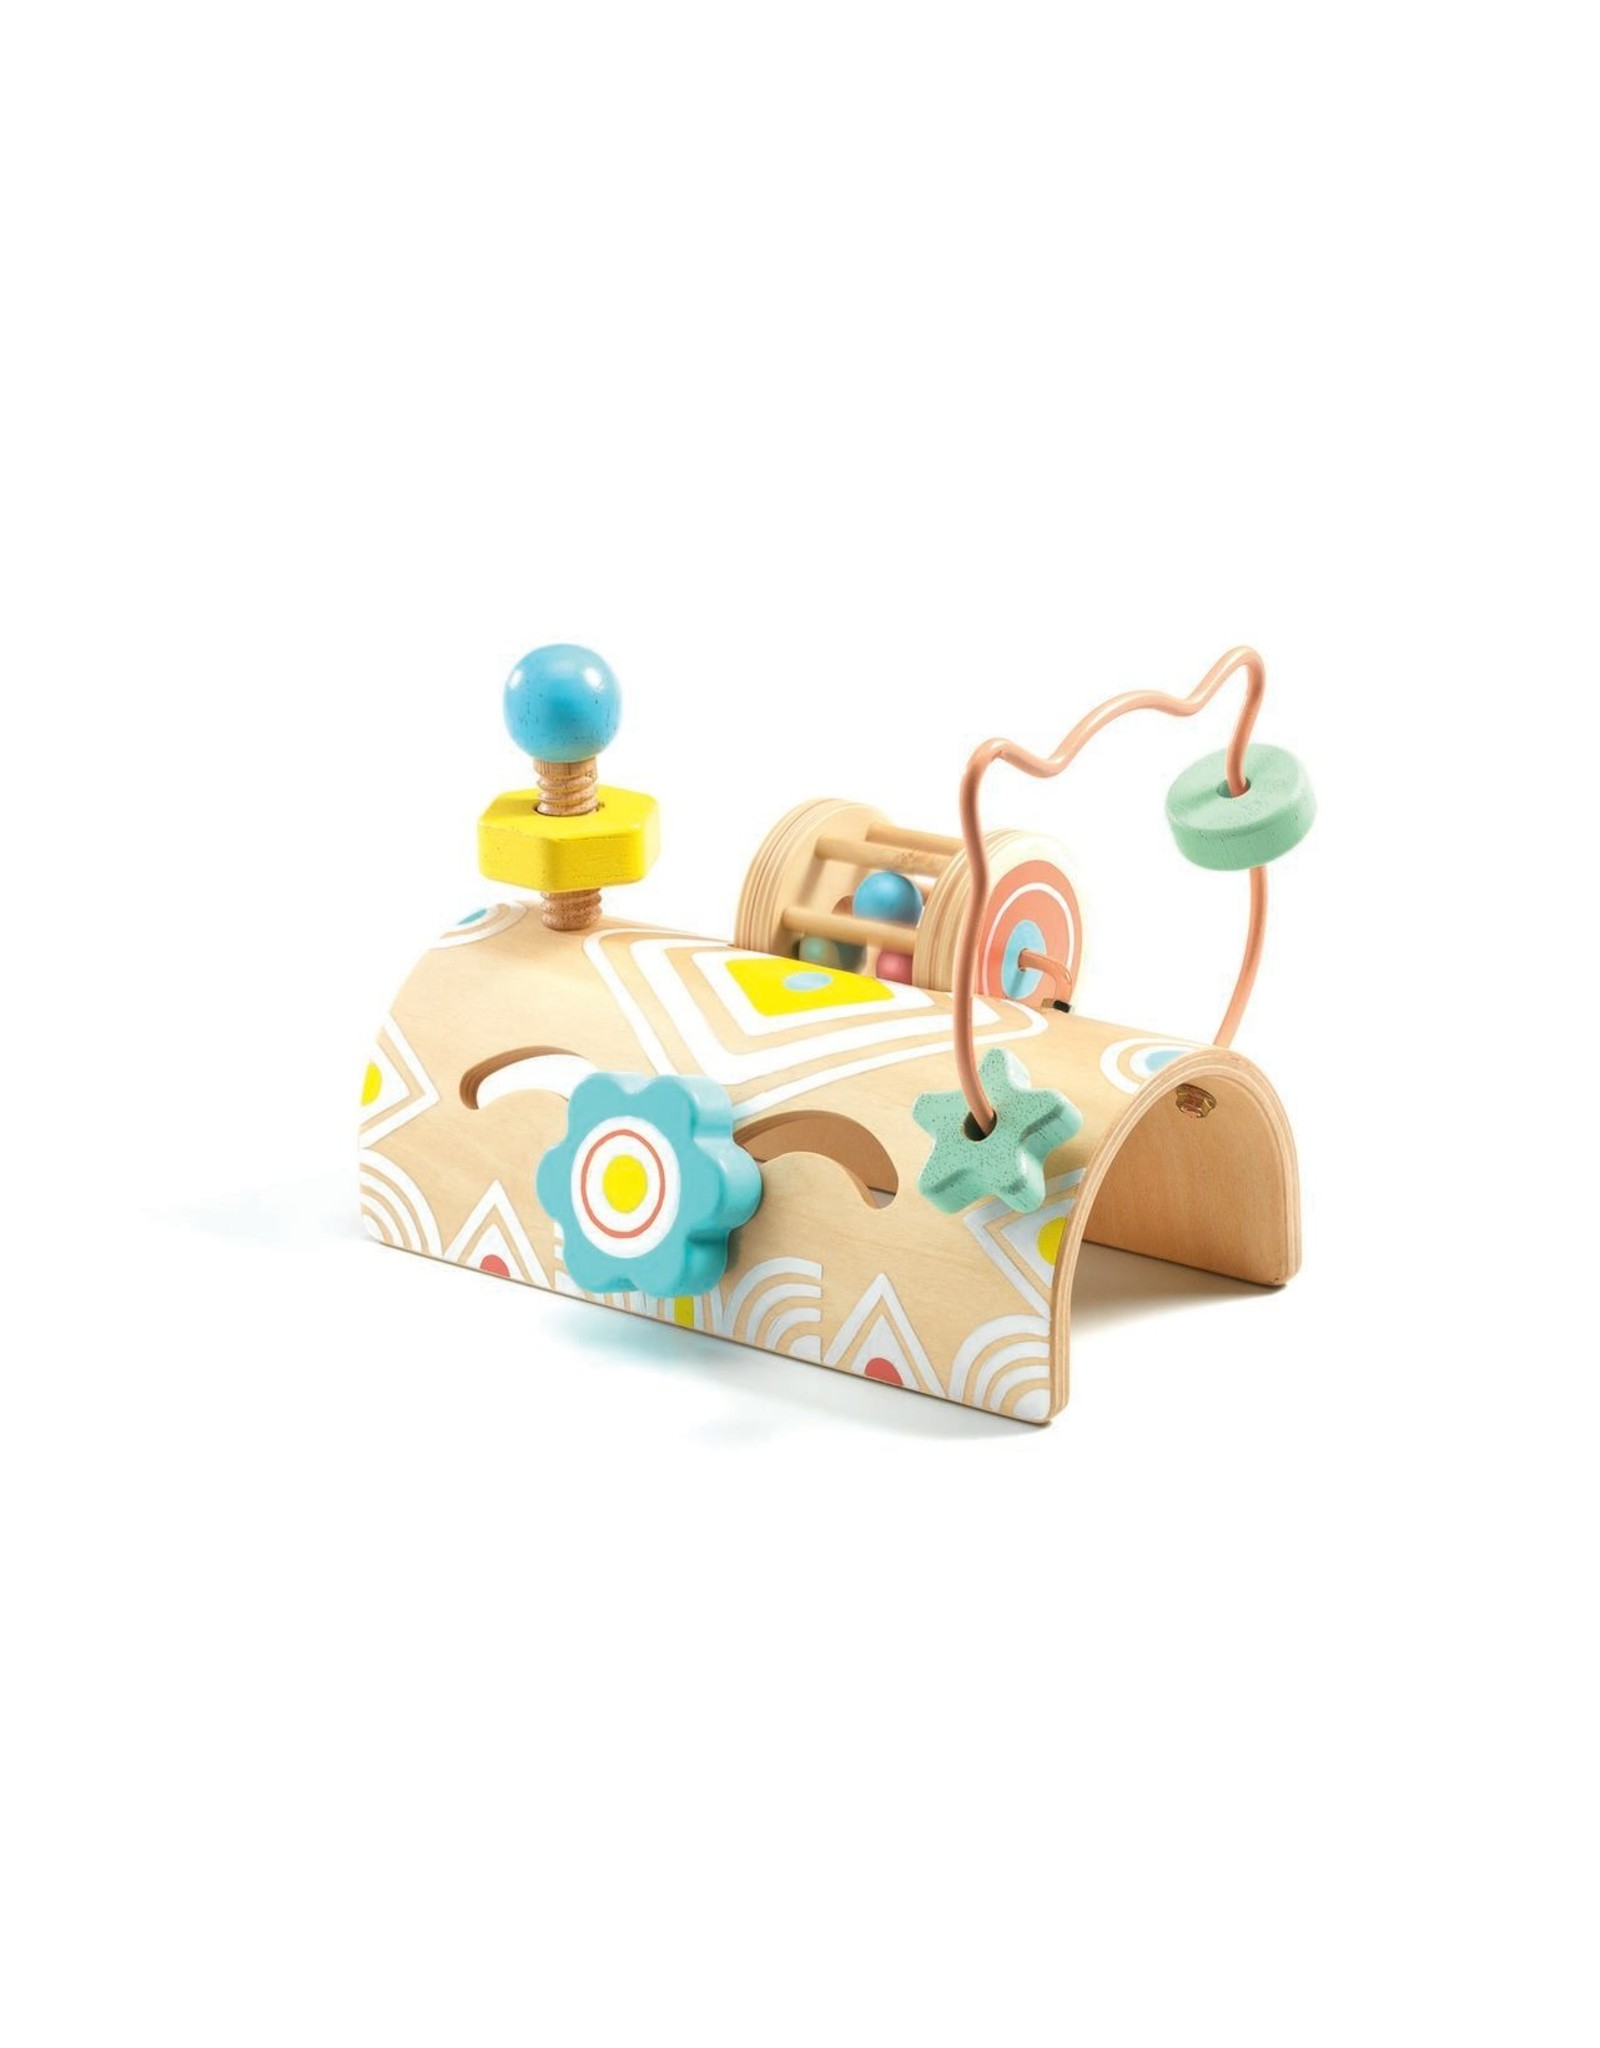 Djeco Baby Tabli Infant Toy